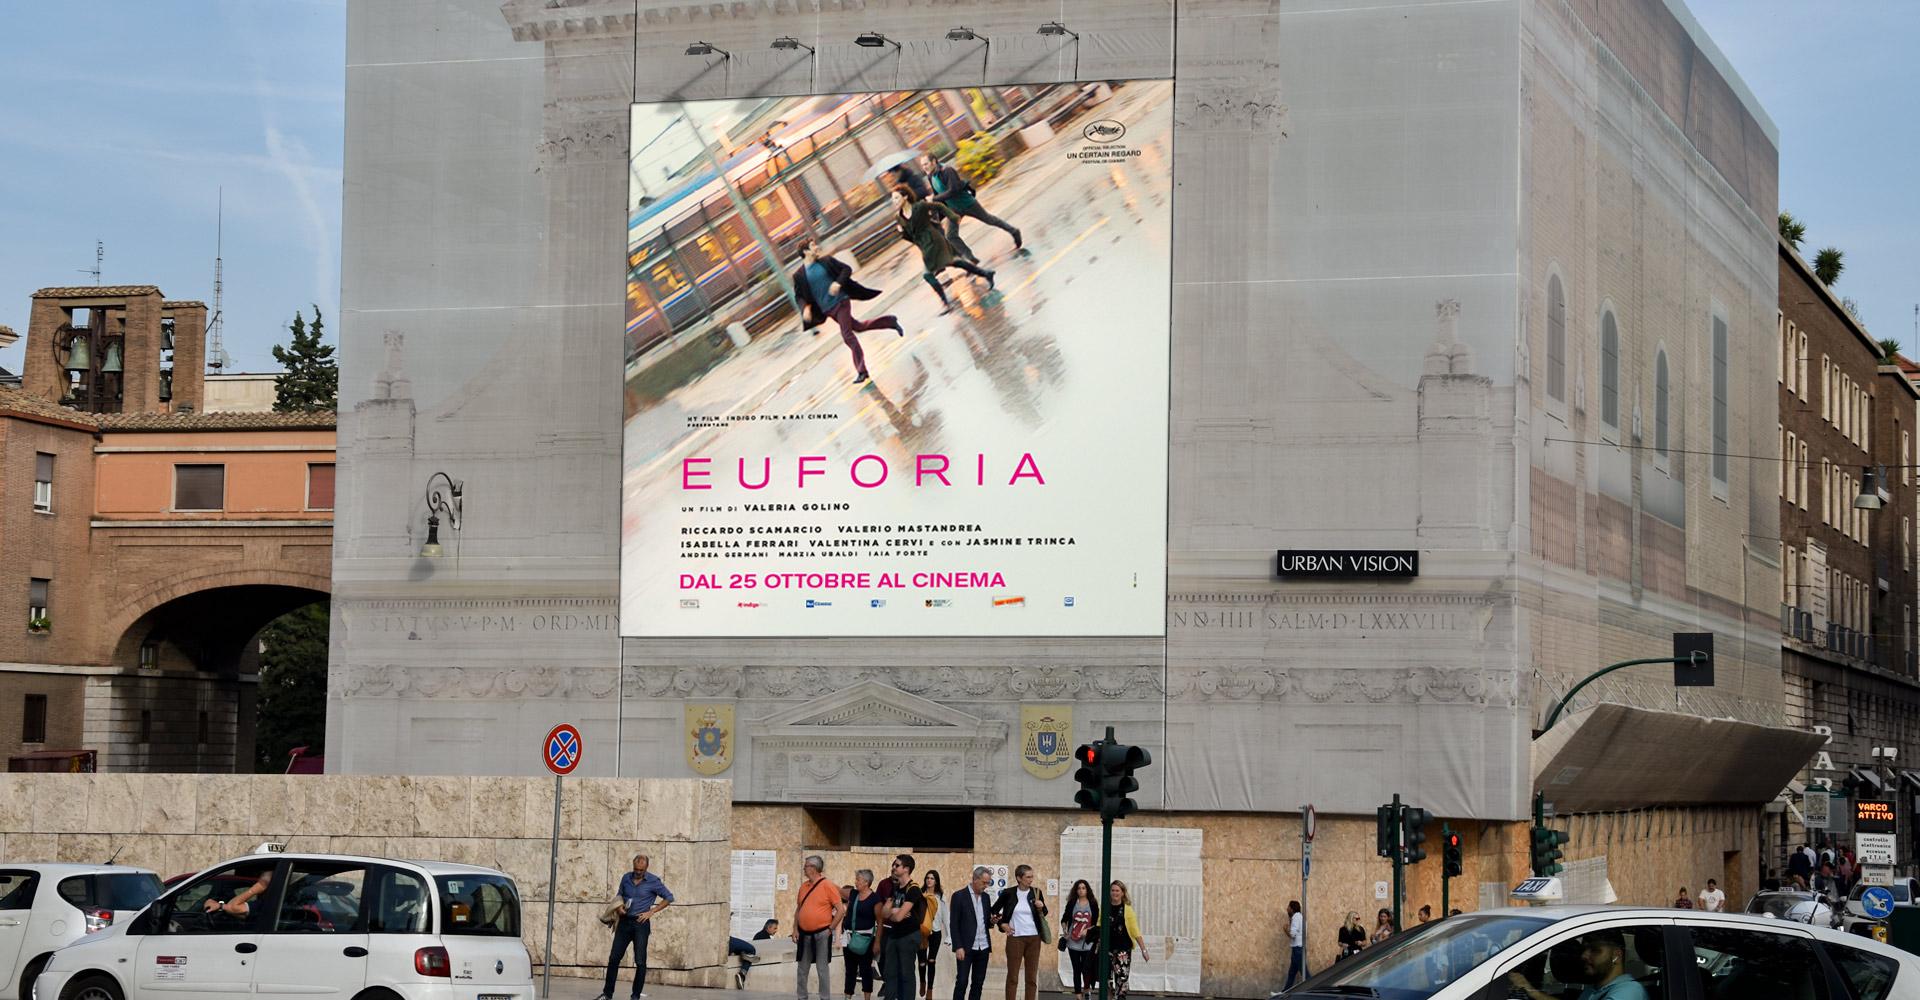 Euforia_Behance_04